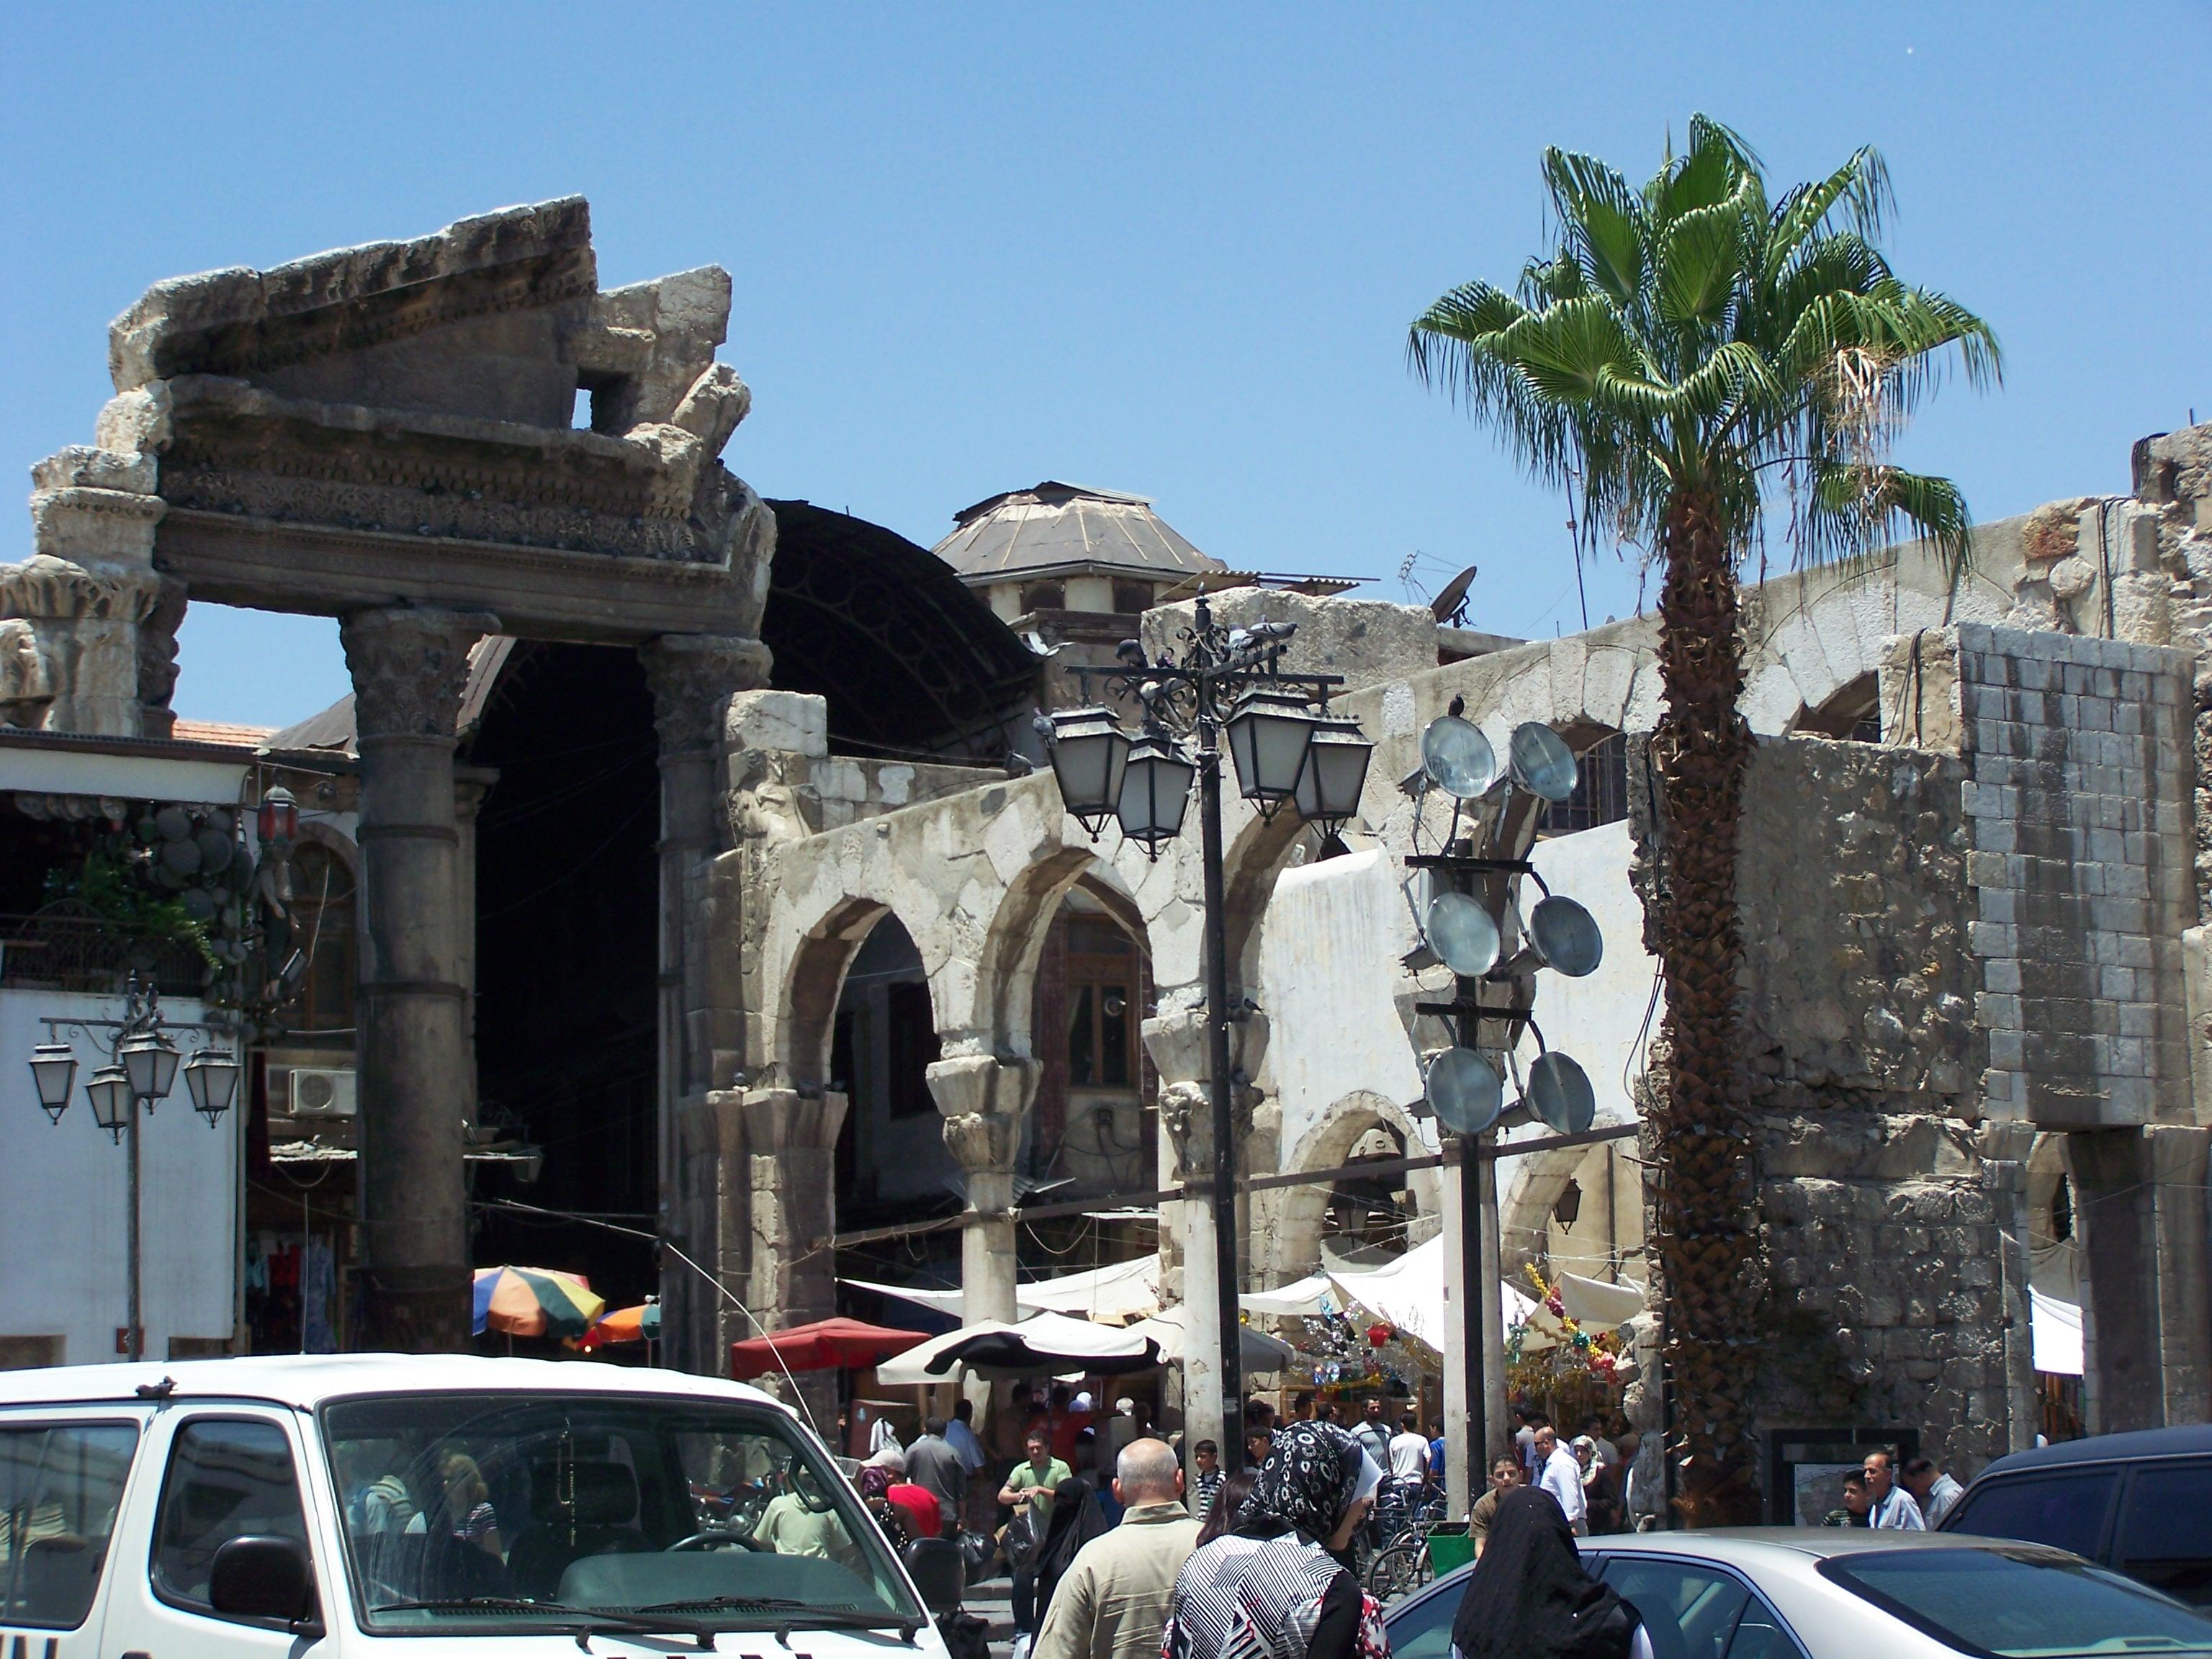 the great sukh - Ancient City of Damascus - Syrian Arab Republic Cathrin Eszbach